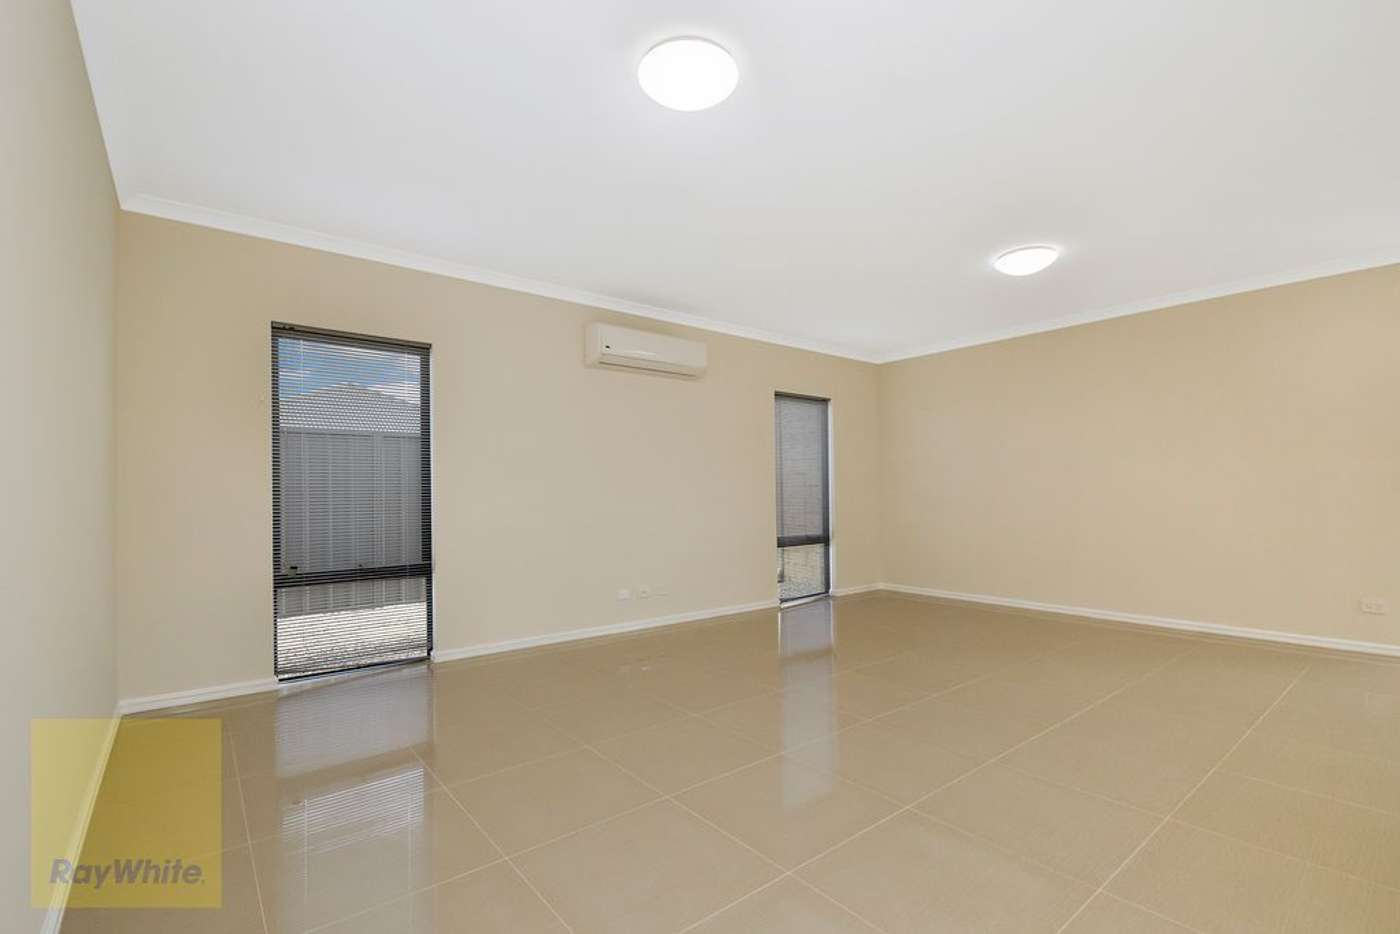 Seventh view of Homely house listing, 58 Castella Drive, Caversham WA 6055